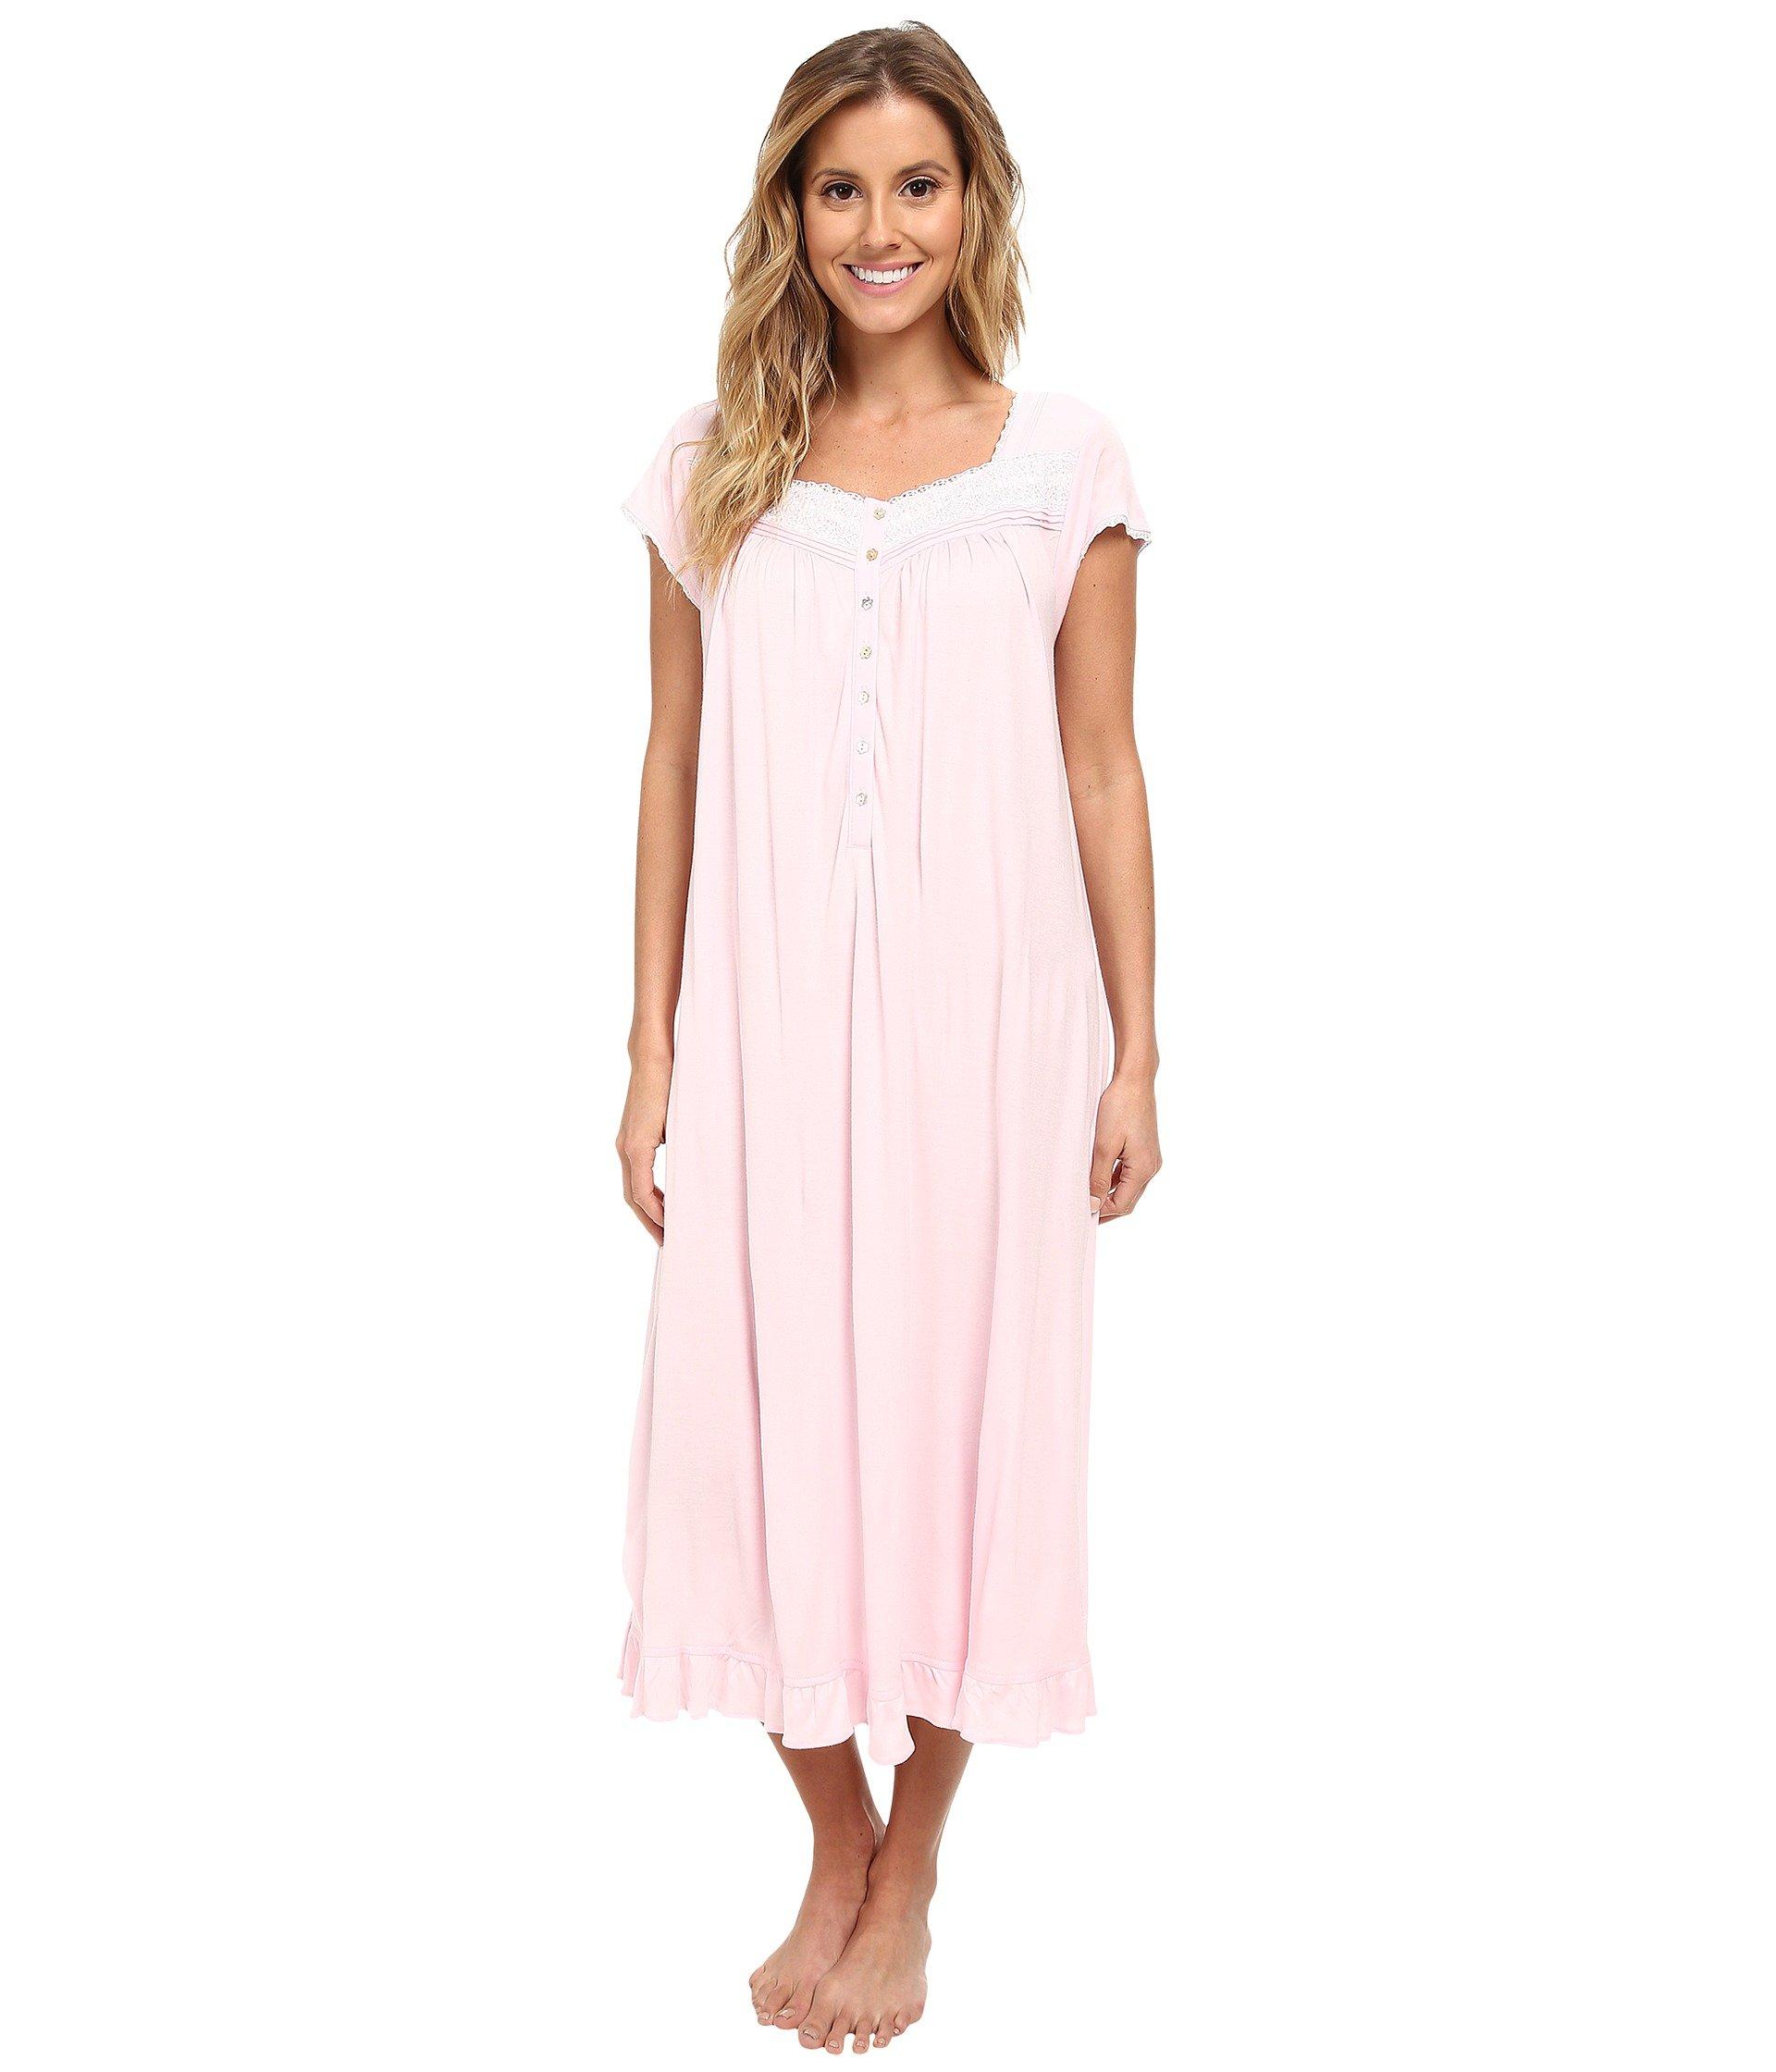 Eileen West, Lyst - Eileen West Muir Beach Bliss Short Gown in Pink